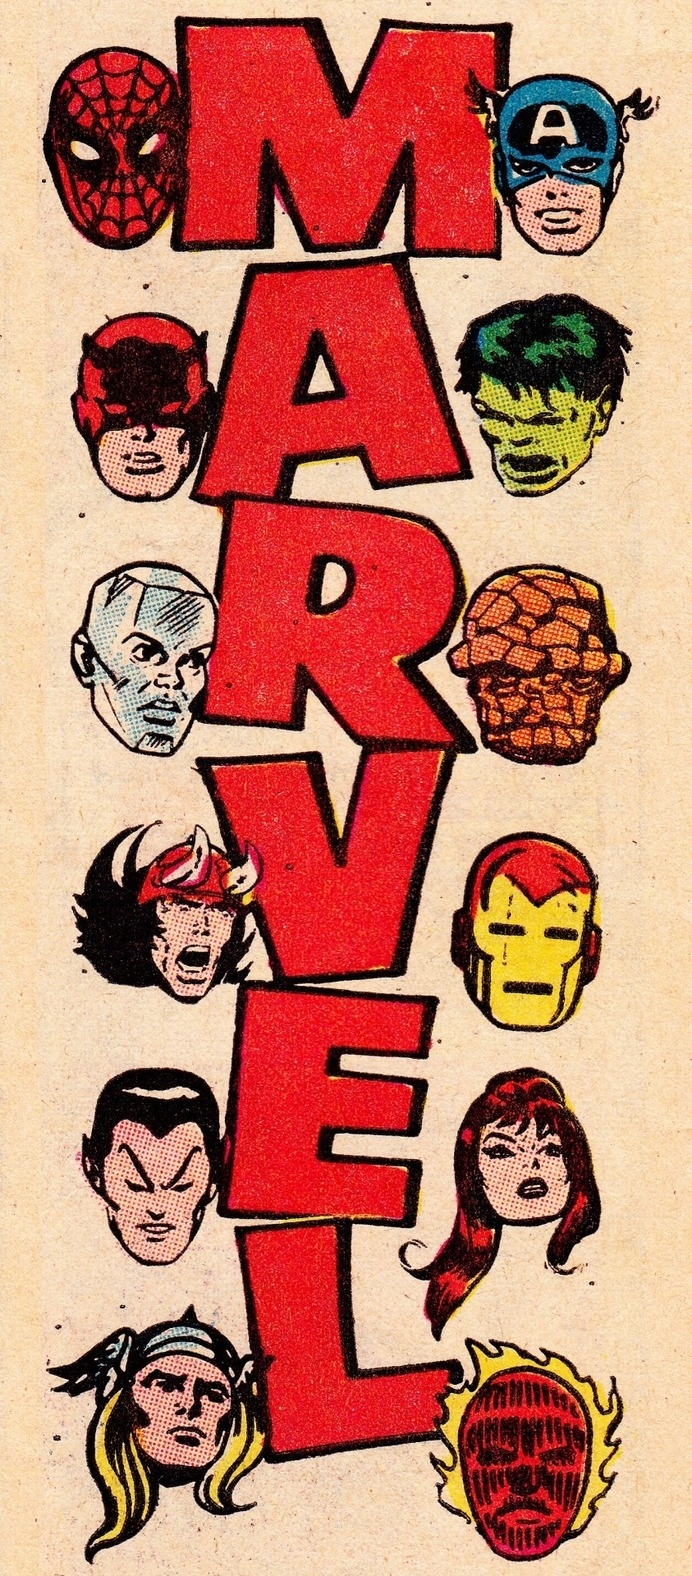 thecomicsvault: M A R V E L Â C O M I C SÂ #dare #hulk #thor #spiderman #captain #nostalgia #iron #comic #devil #illustration #vintage #marvel #america #man